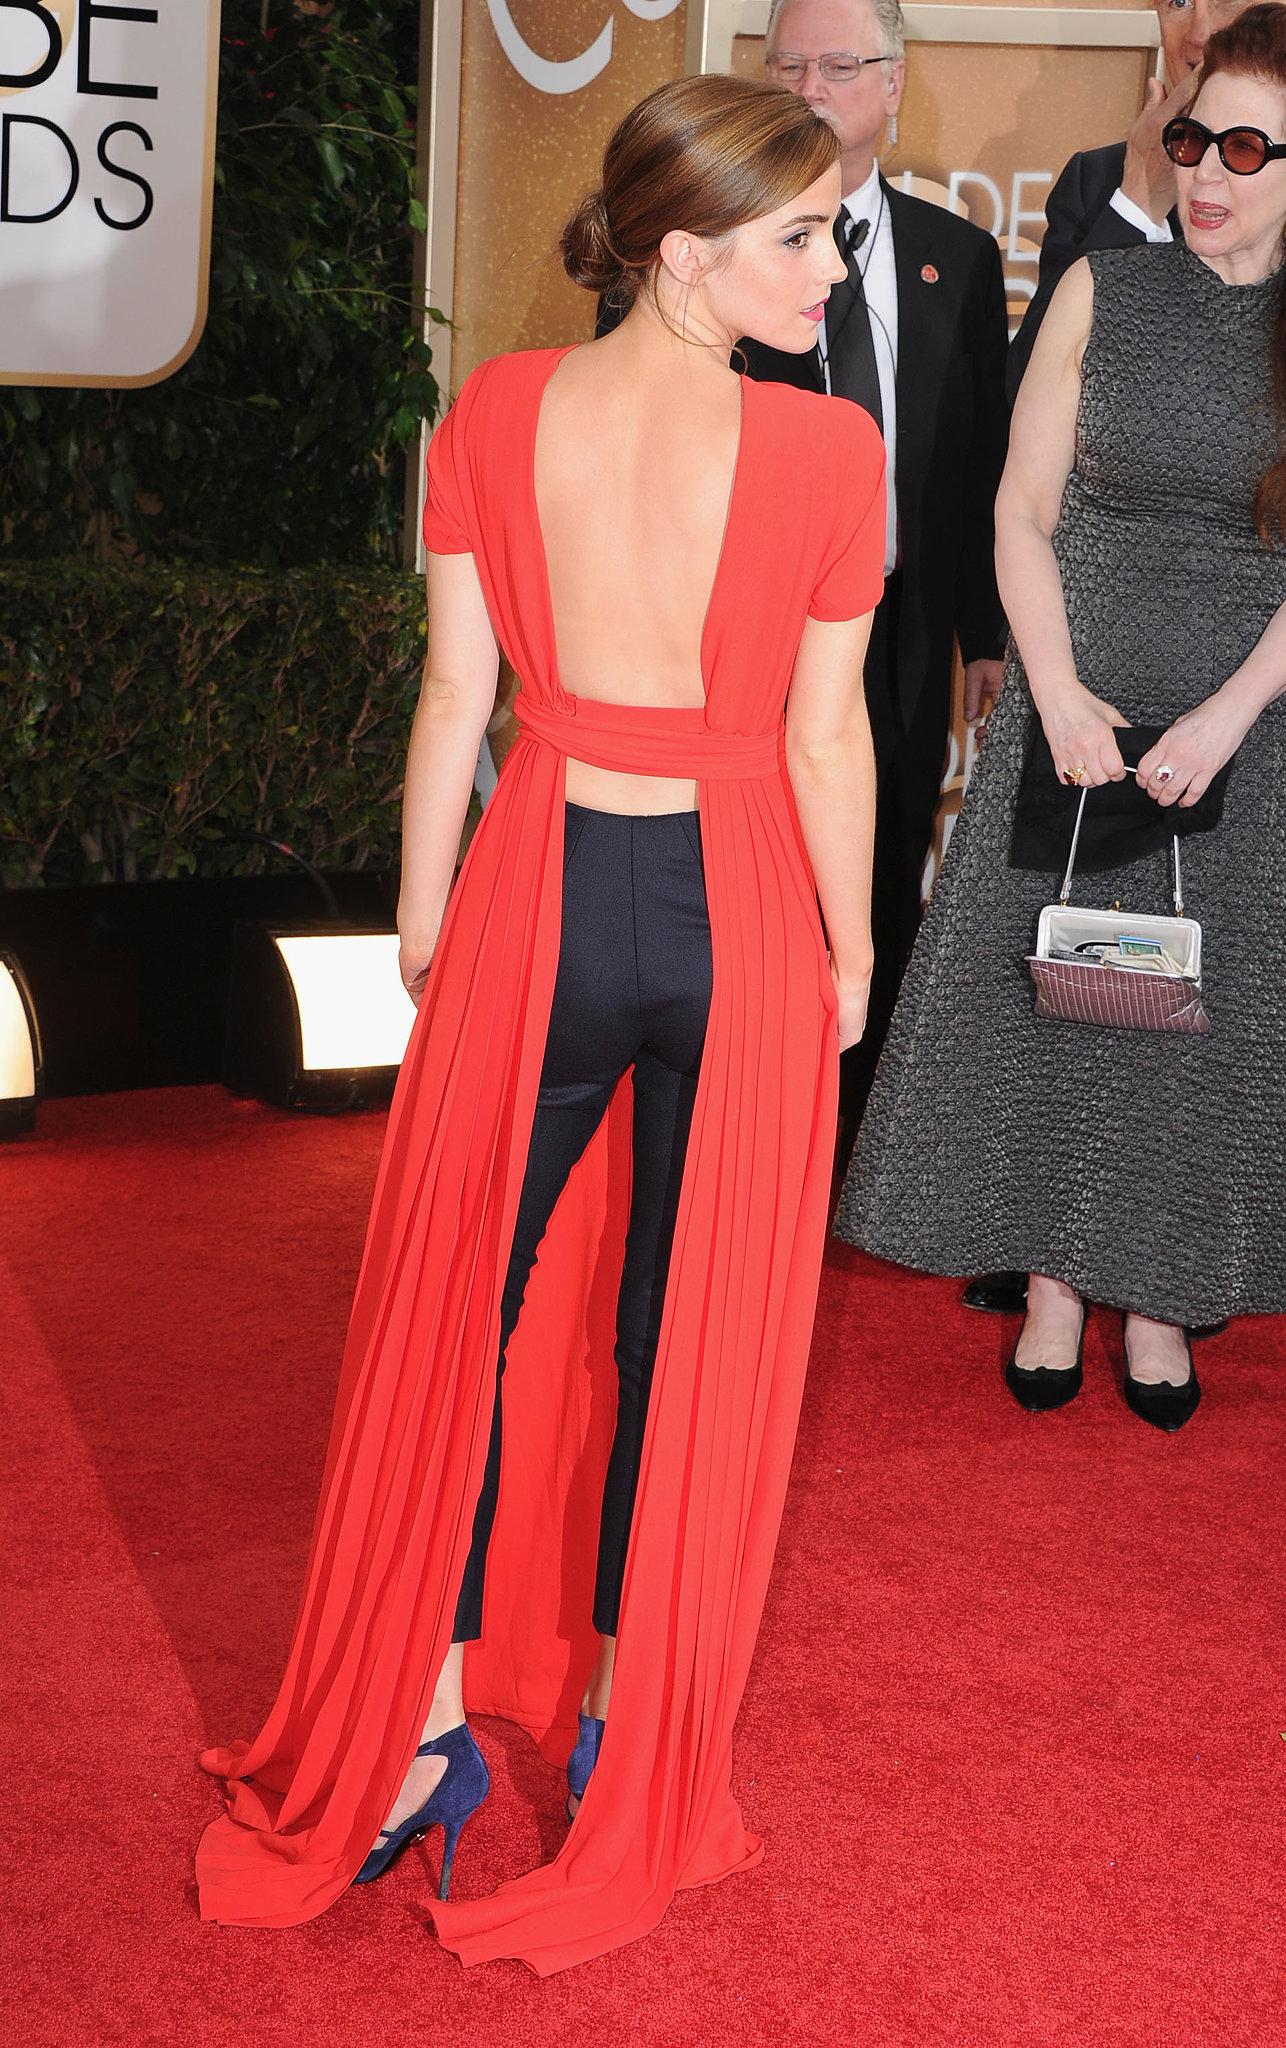 Emma Watson Dress on Golden Globes 2014 Red Carpet | POPSUGAR Fashion